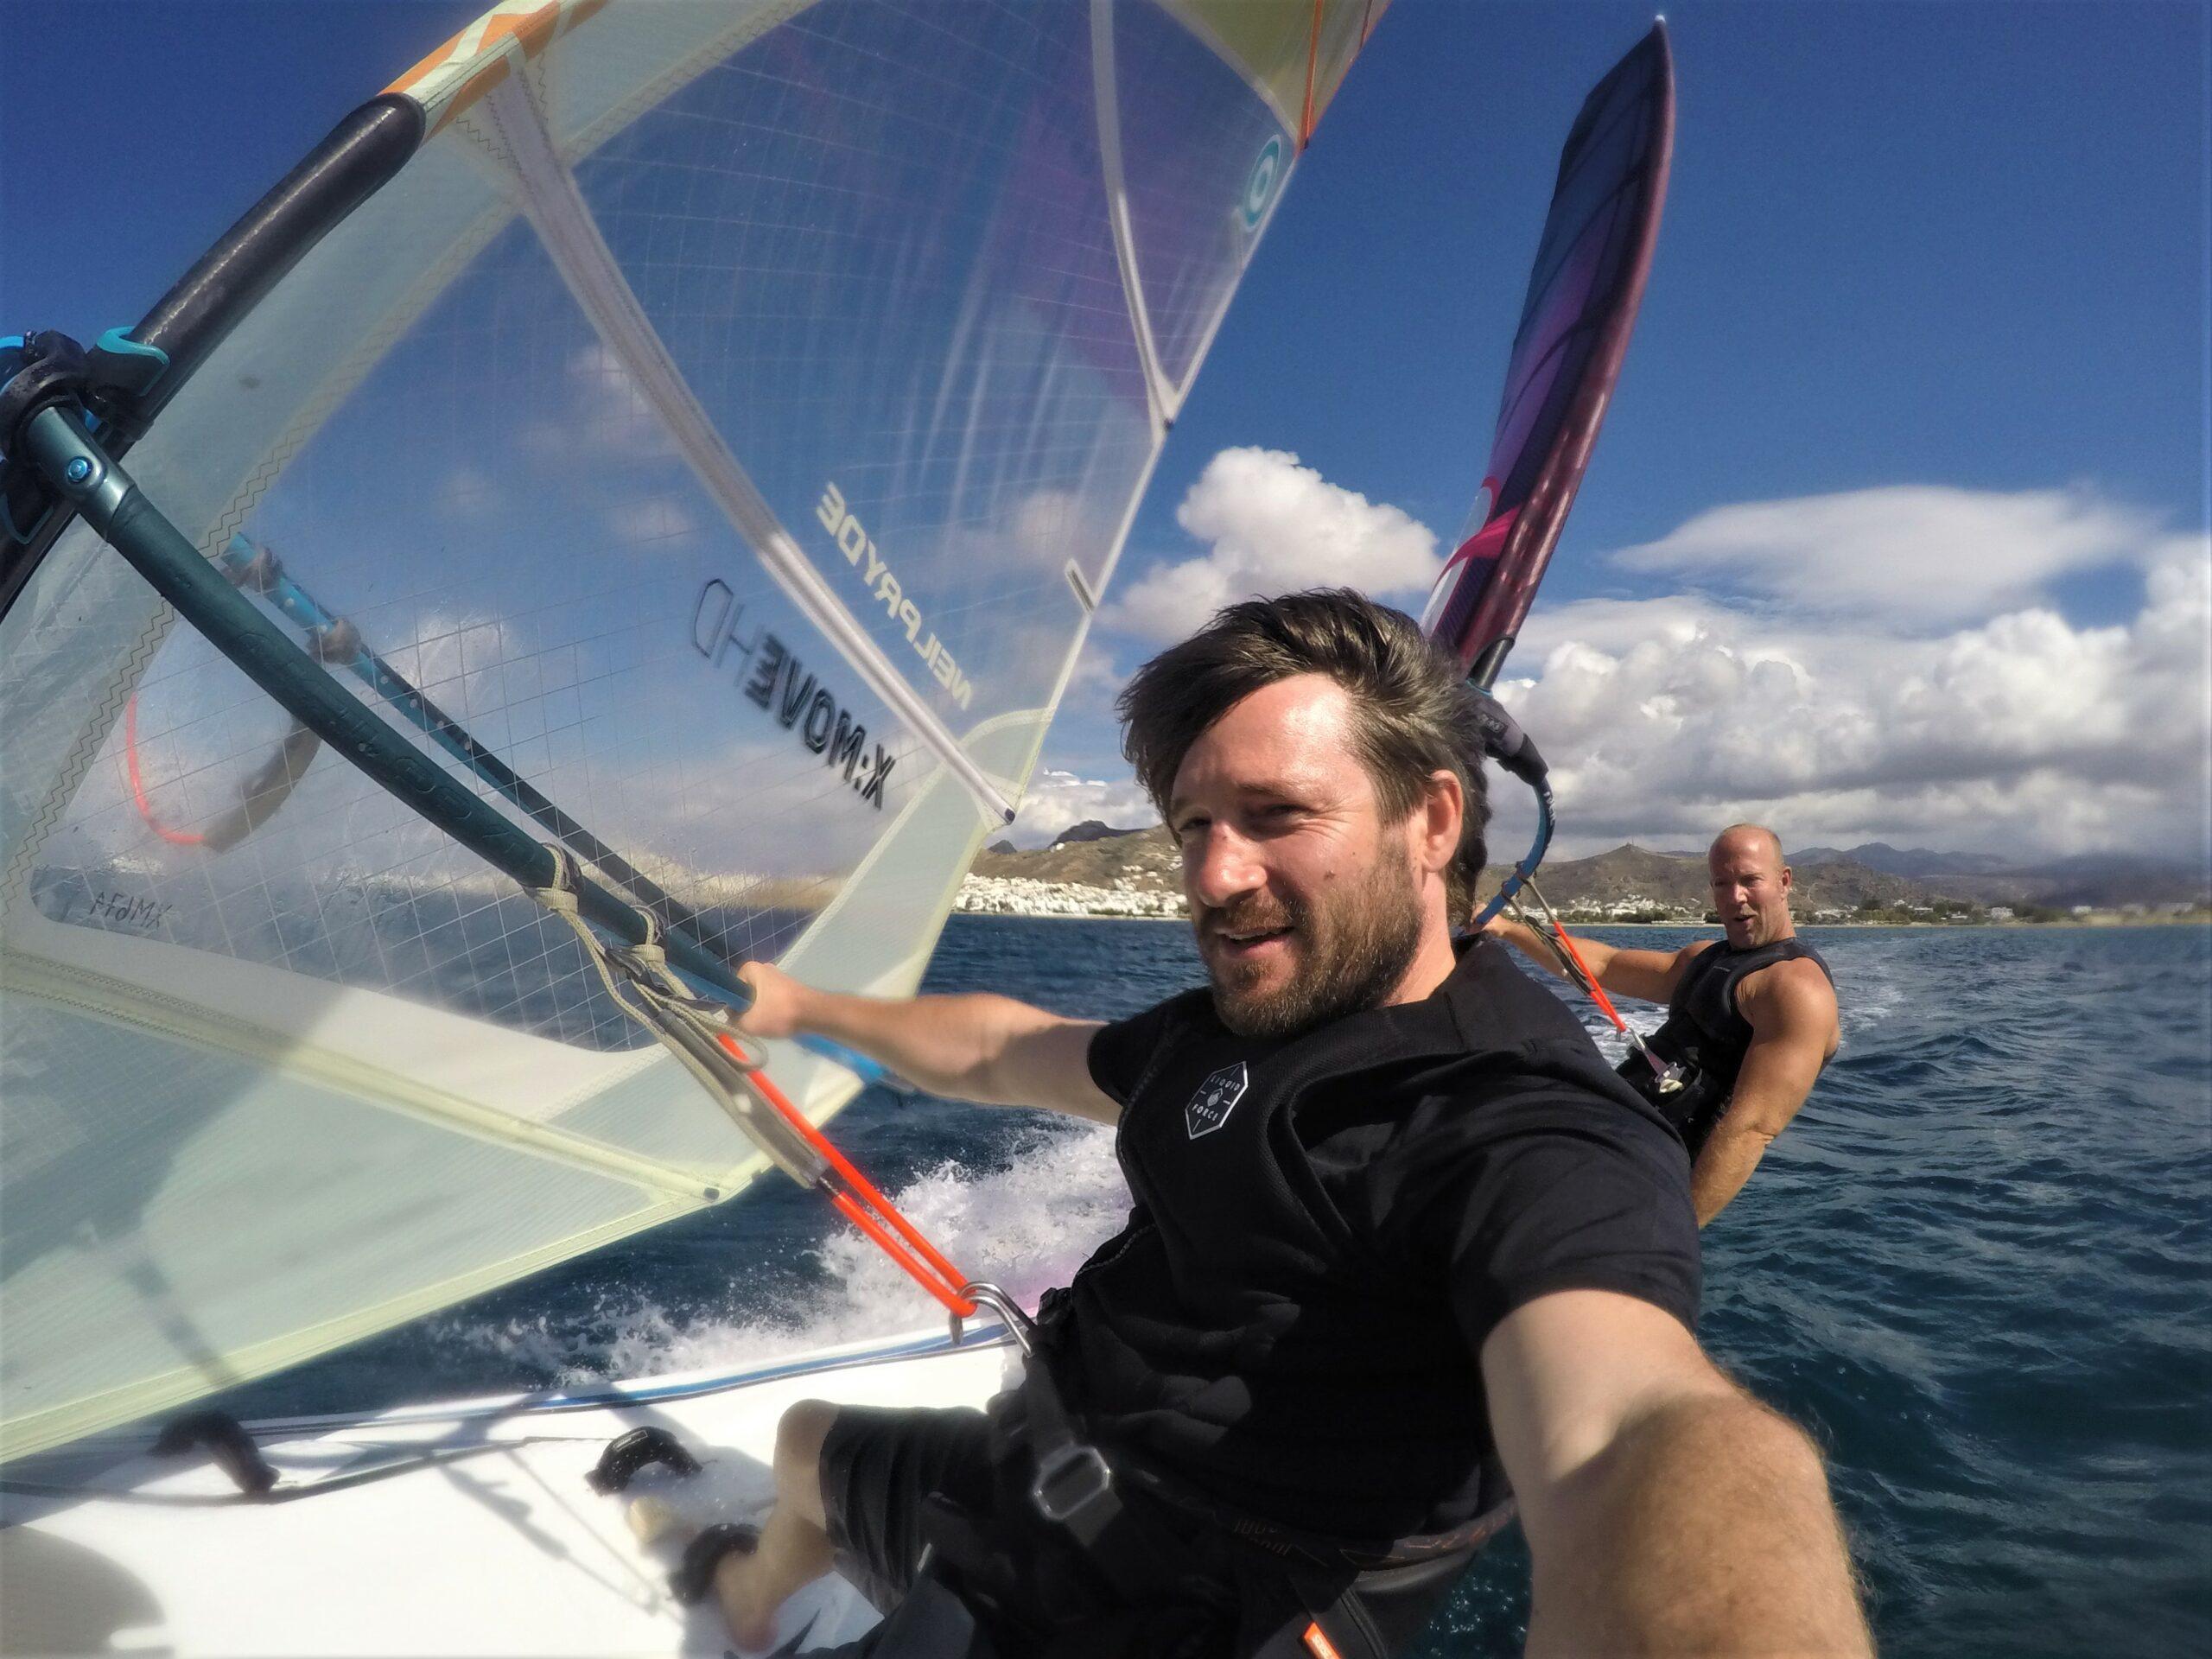 twinboard rrd neipryde sail urlaub ferien sommer windsurfing naxos greece flisvos sport club lessons centre laguna